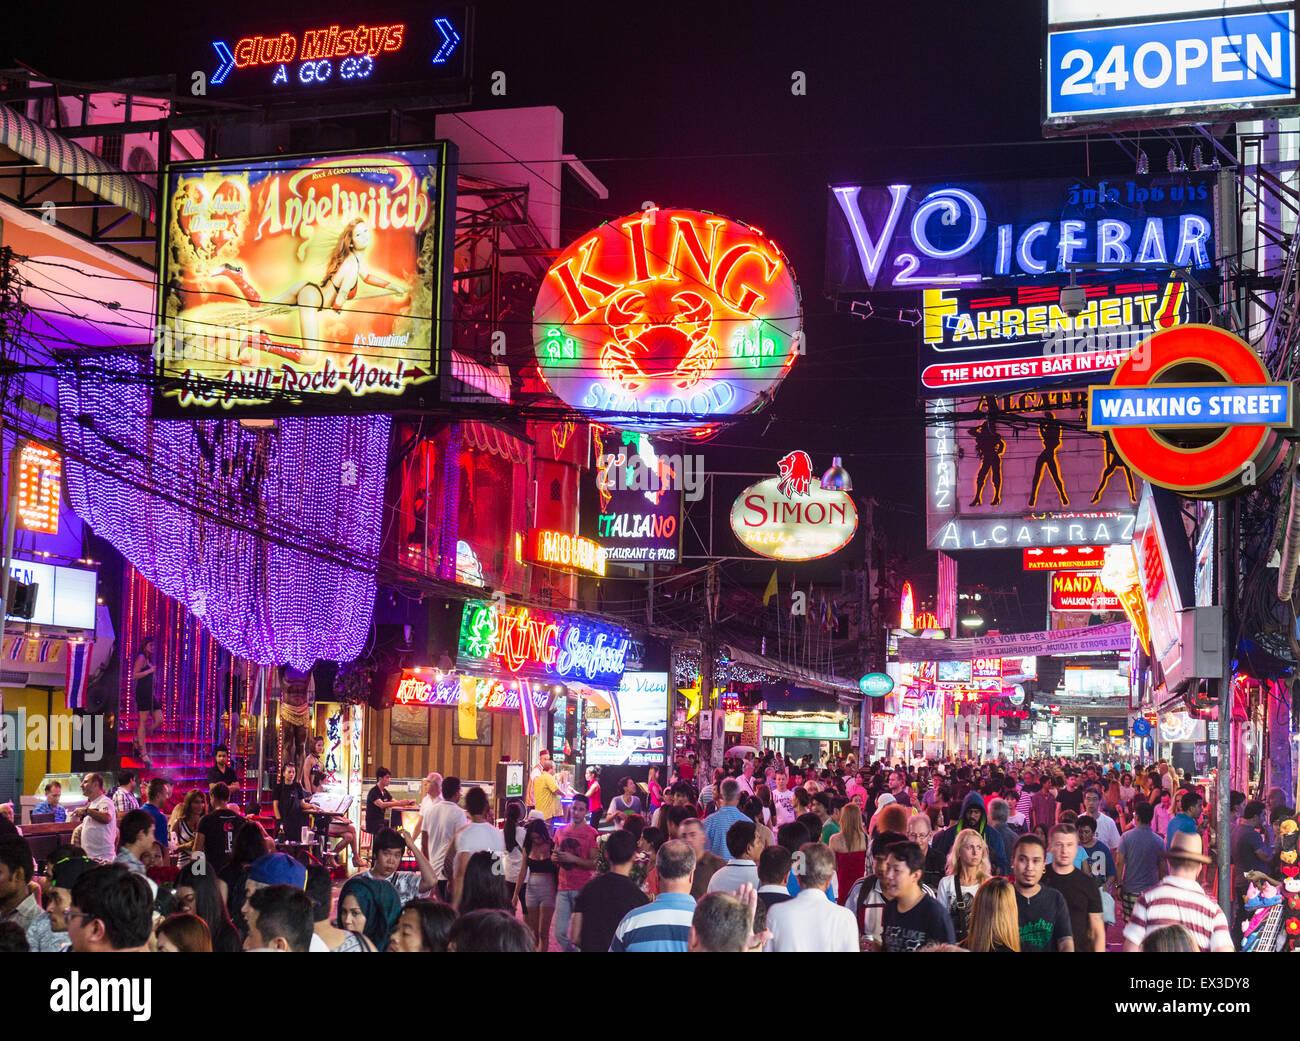 Walking Street pedestrian zone, nightlife, bars, nightclubs, neon signs, Pattaya, Chon Buri Province, Thailand - Stock Image